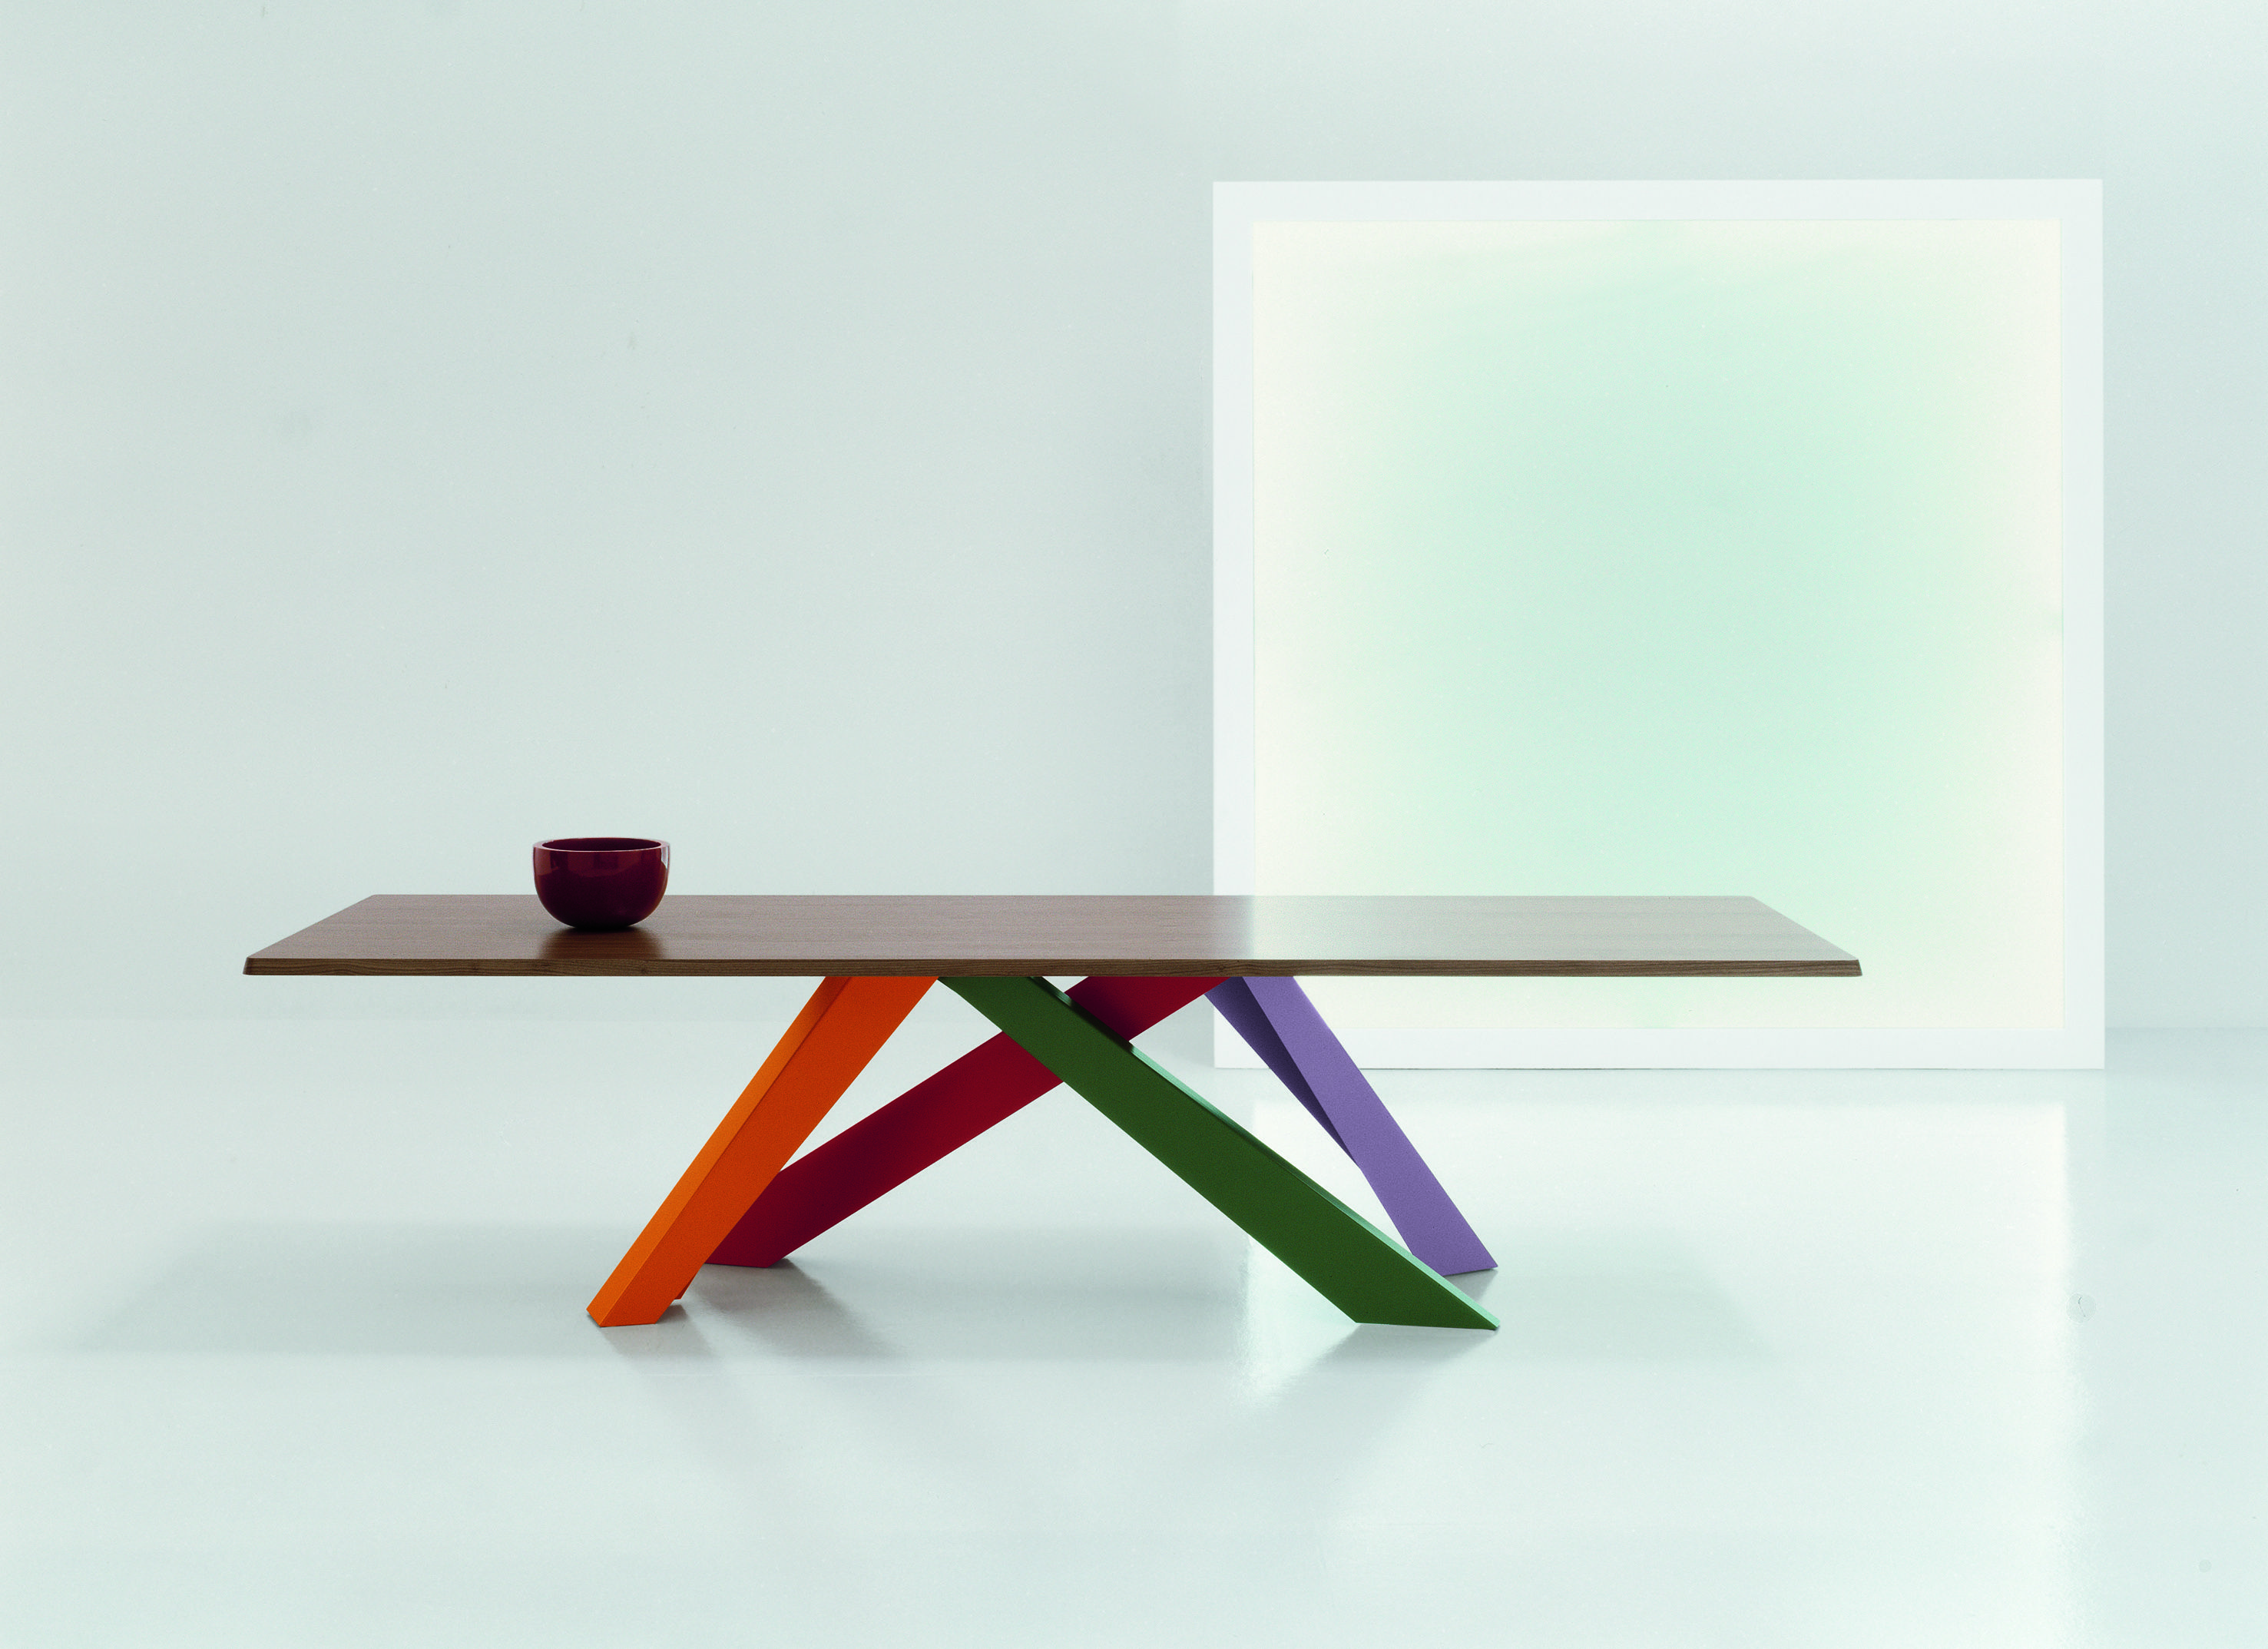 Big Table, Bonaldo, design: Alain Gilles, polish agent of Bonaldo ...